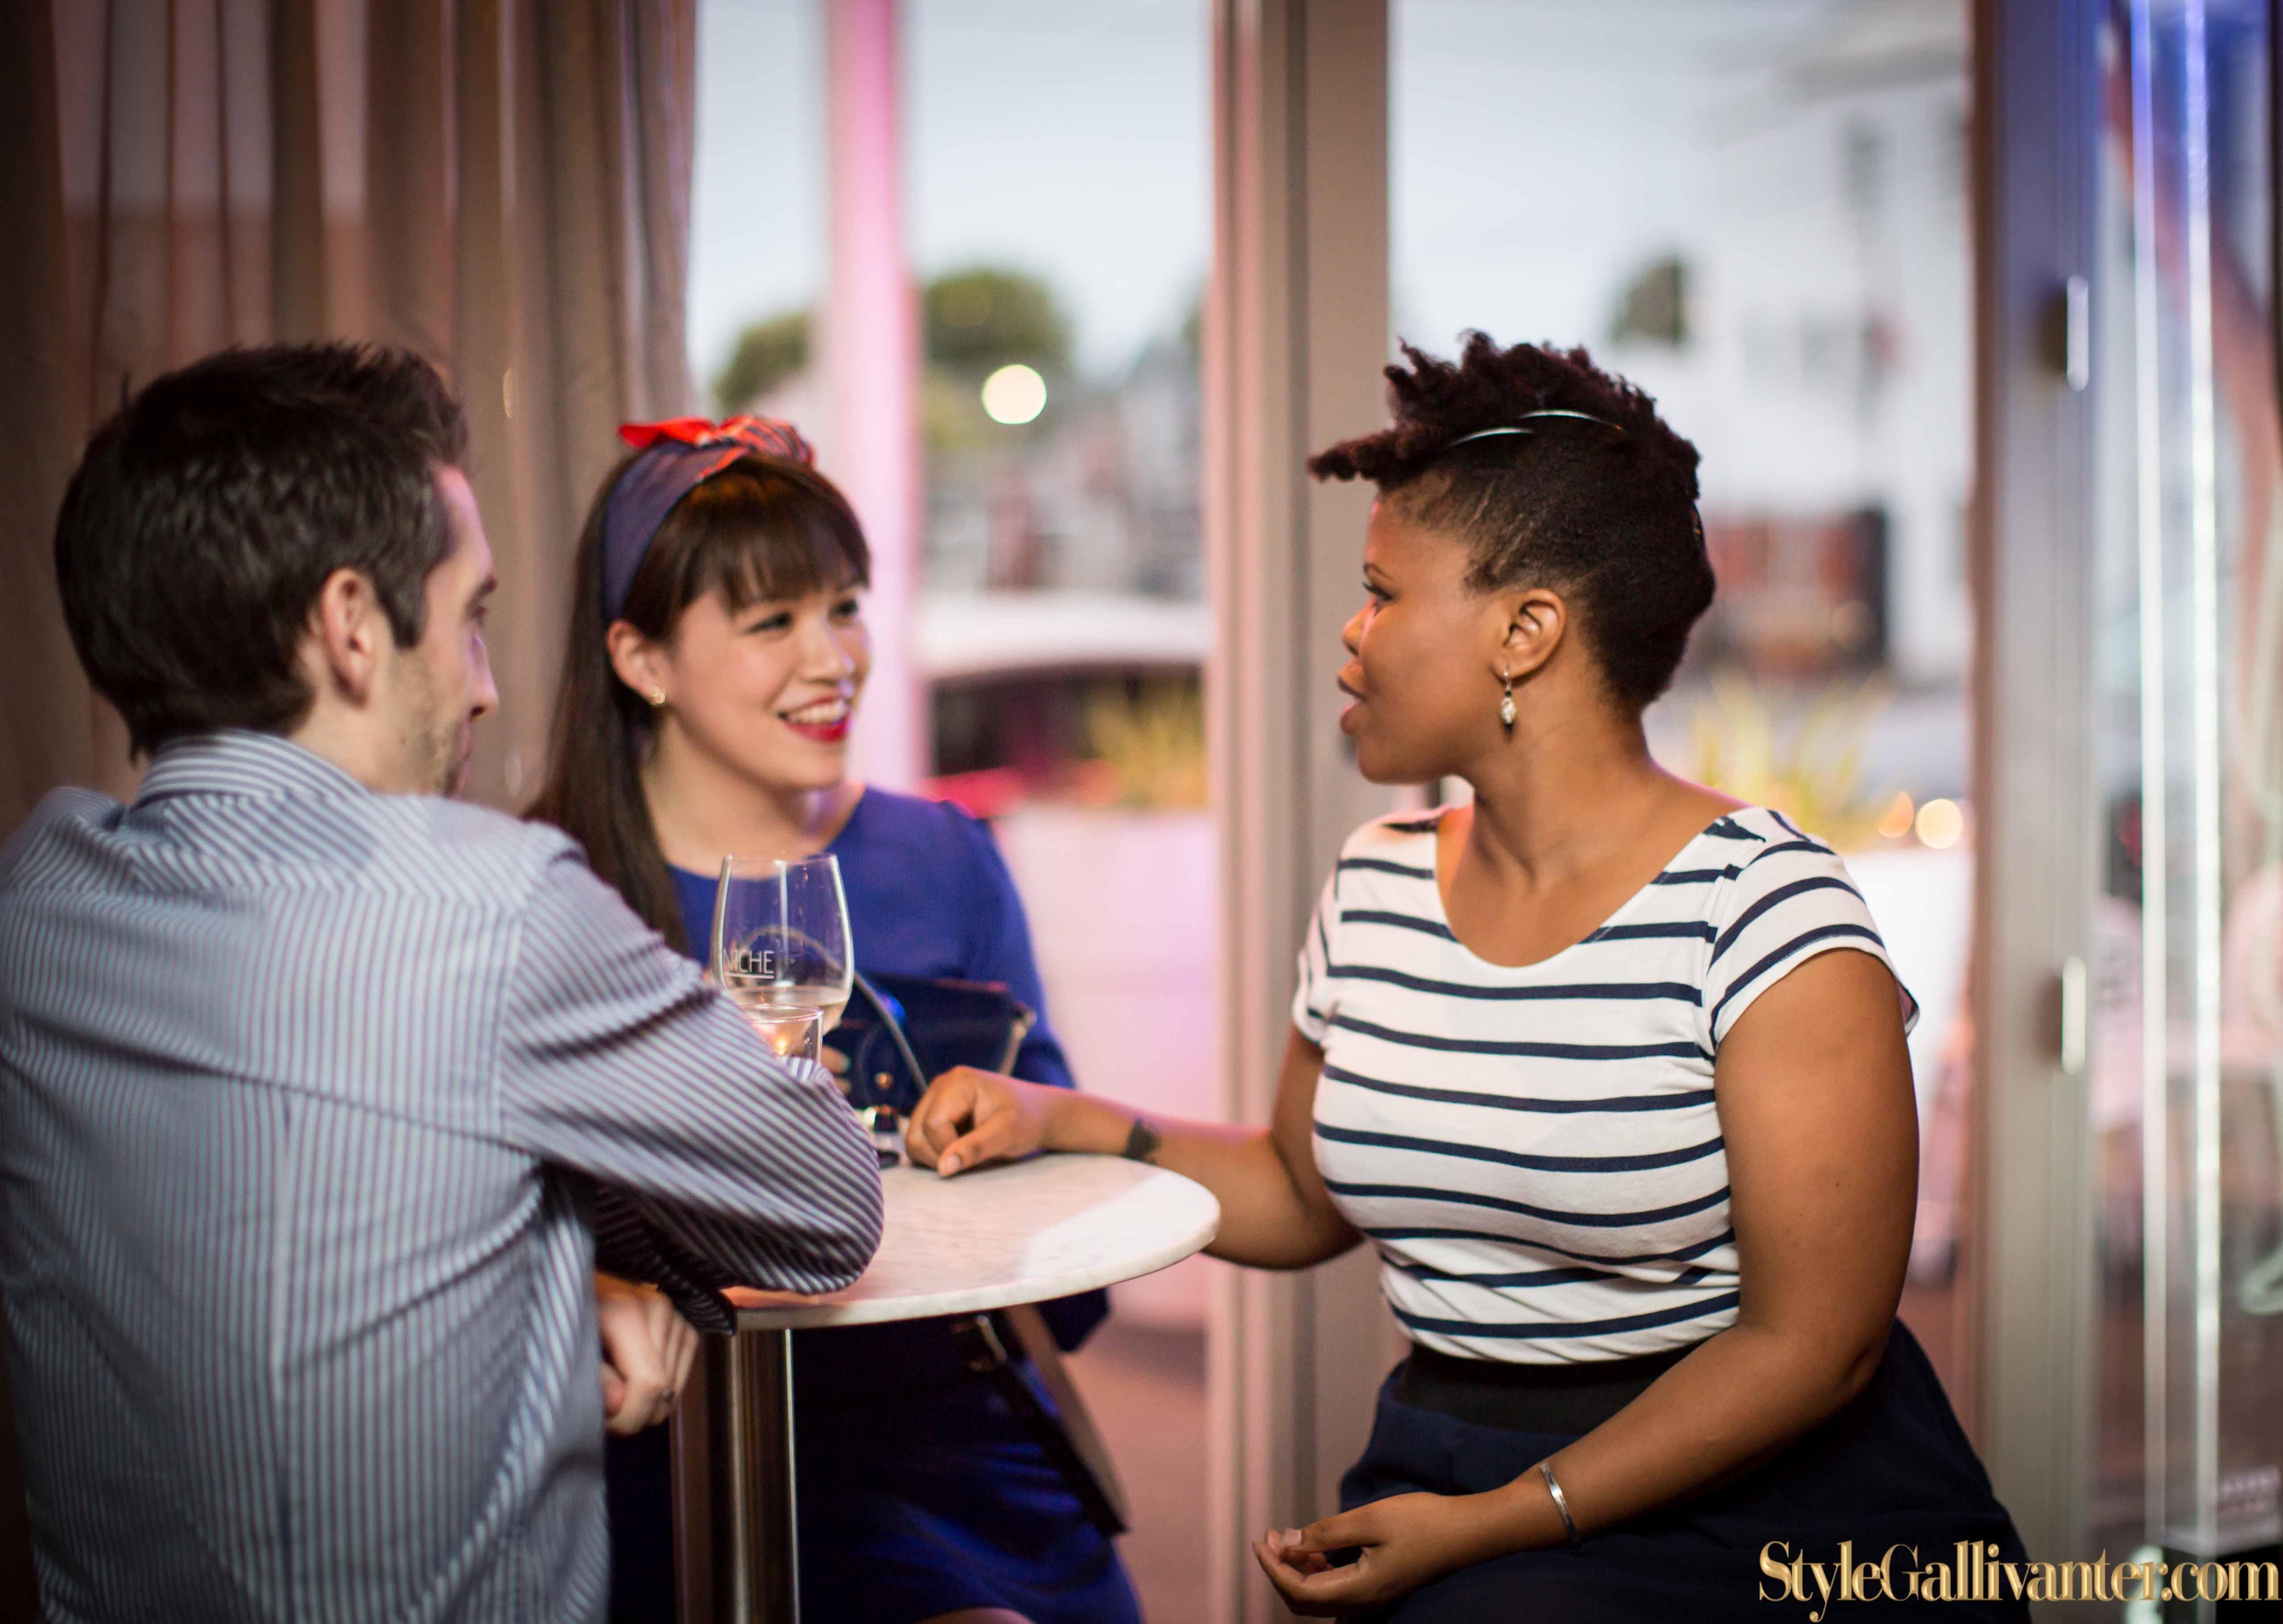 fashion-events-melbourne-2014_niche-on-bridge-restaurant_niche-function-room-richmond_best-venues-melbourne_high-fashion-venues-melbourne_melbourne's-best-fashion-bloggers-2014-2